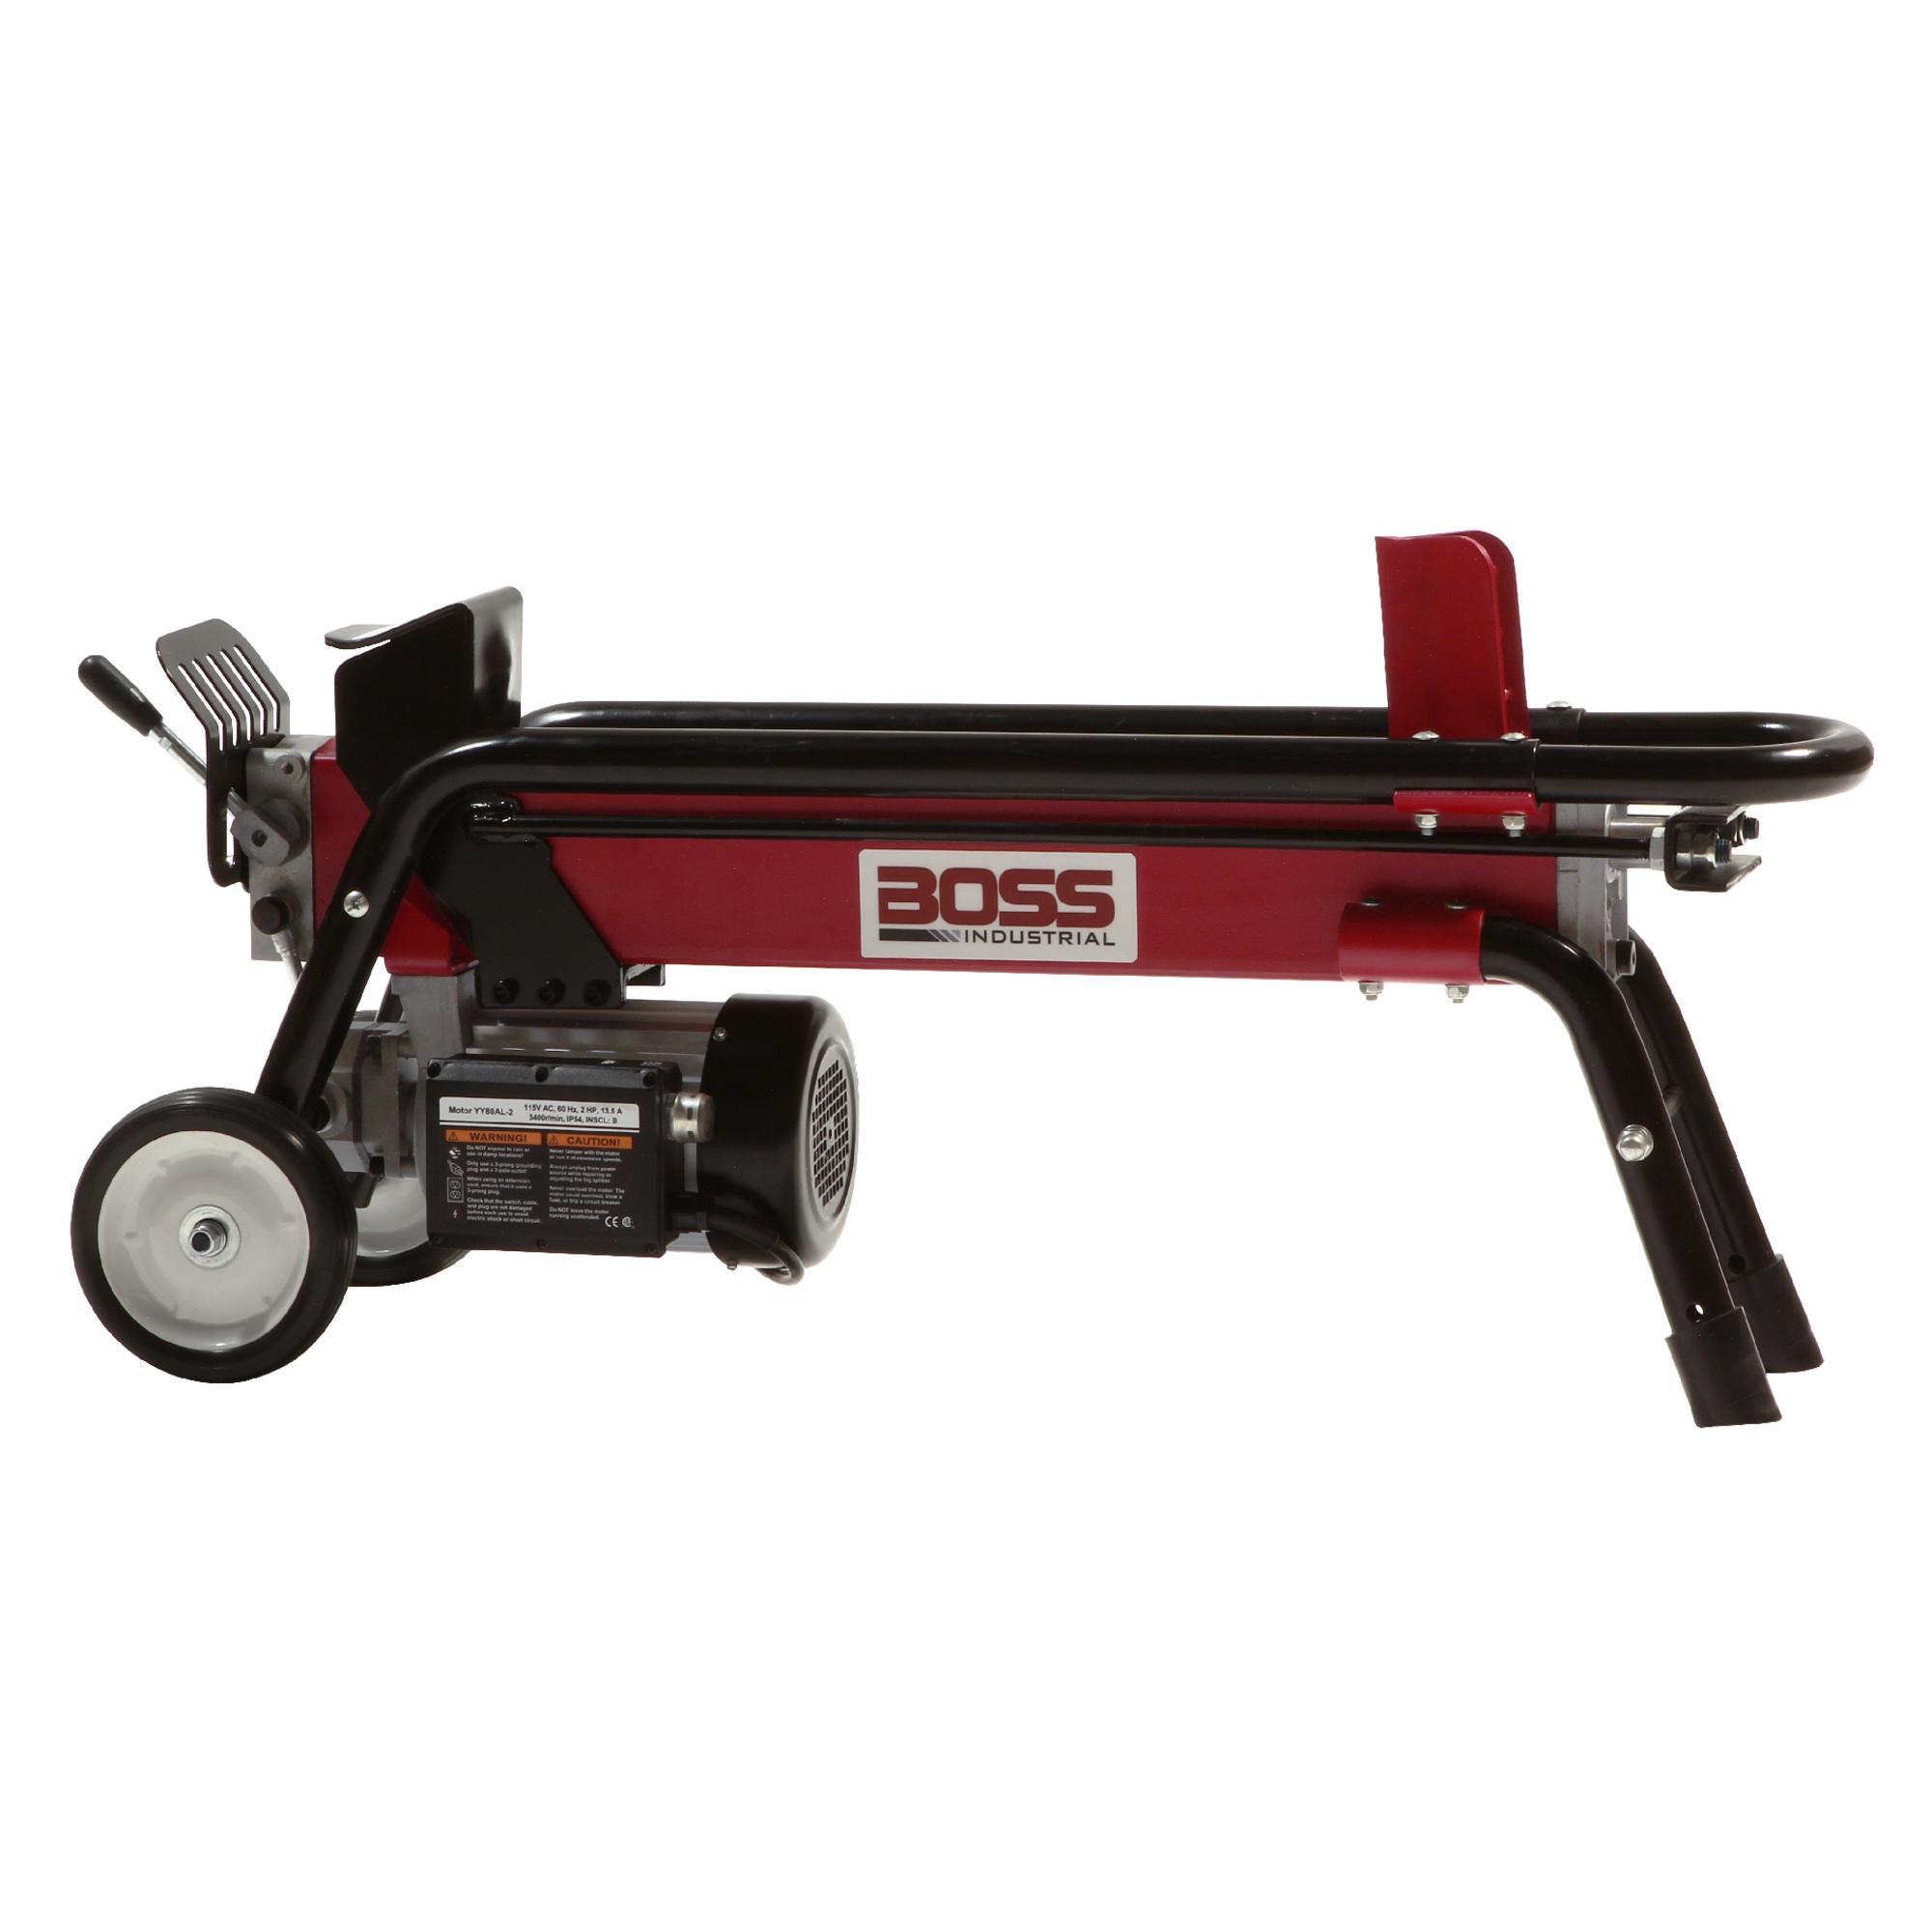 Boss Industrial Es7t20 7 Ton Electric Log Splitter